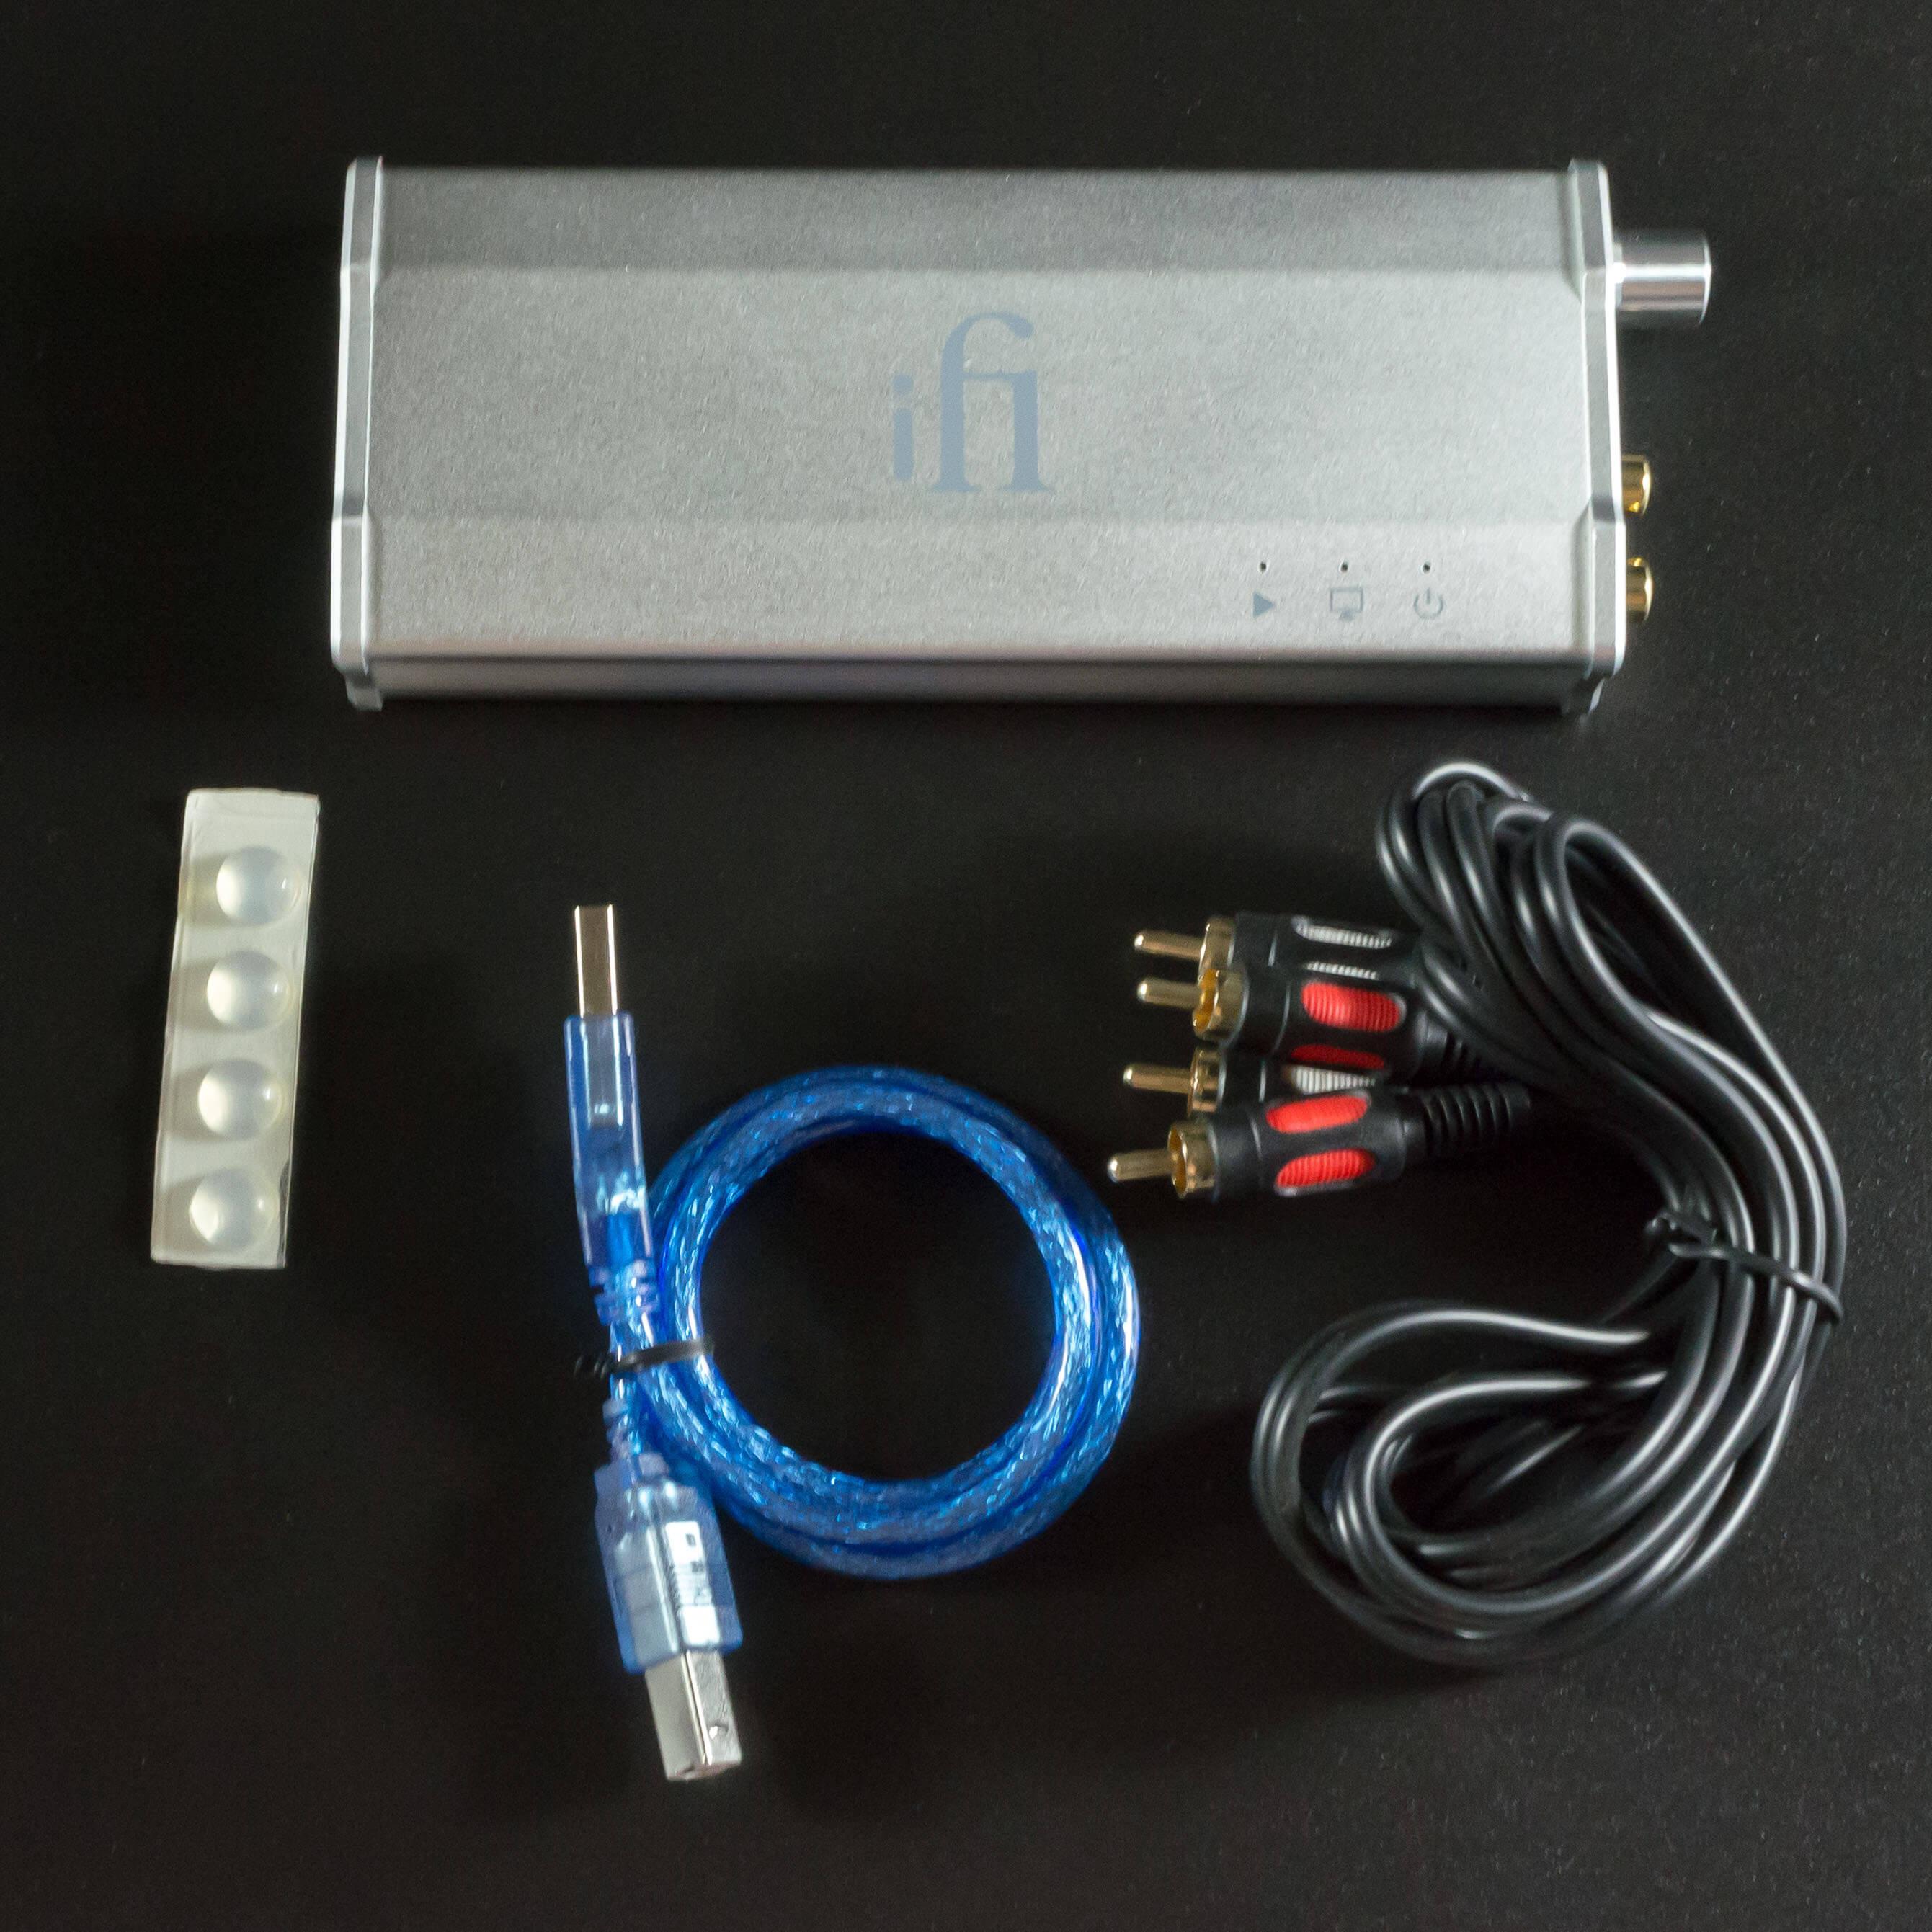 комплект поставки iDAC